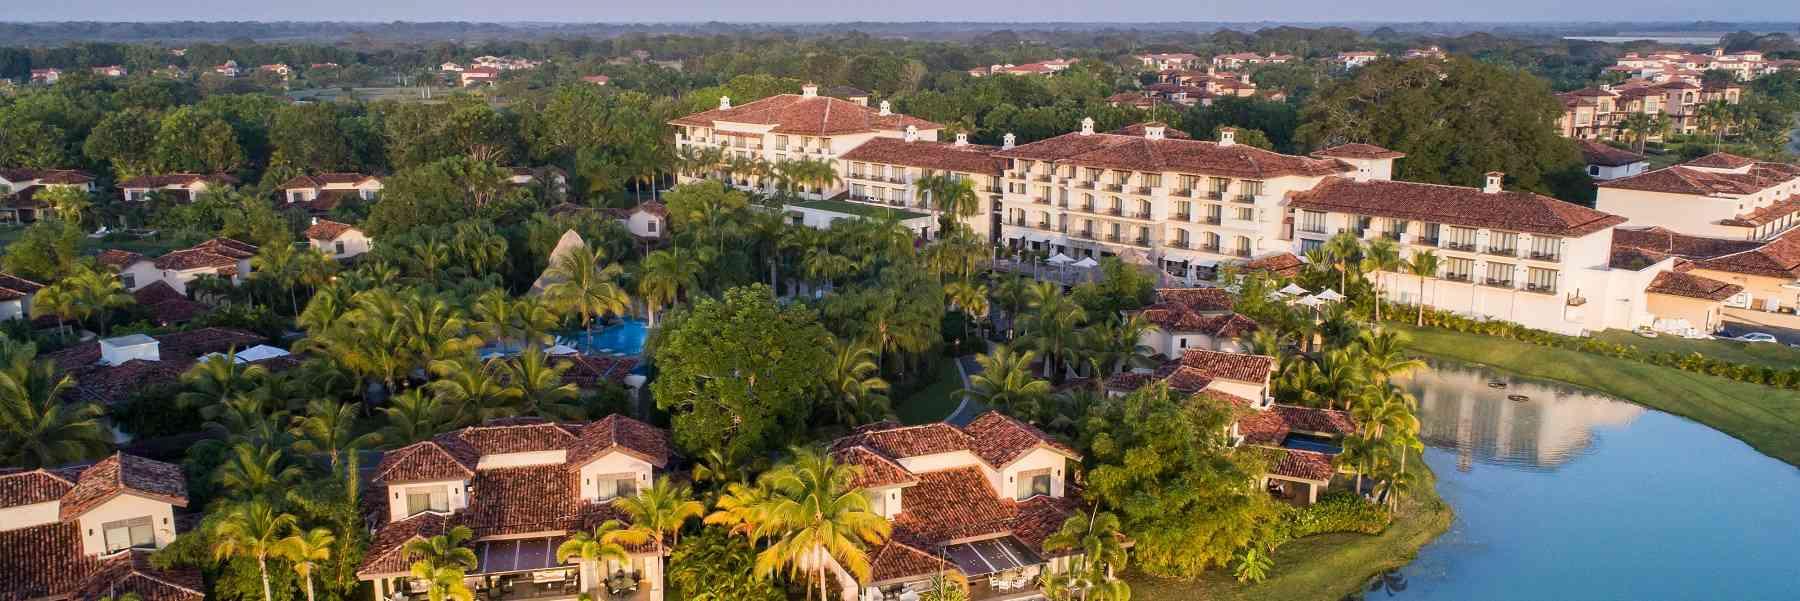 Panama riviera pacifica Buenaventura Golf & Beach Resort